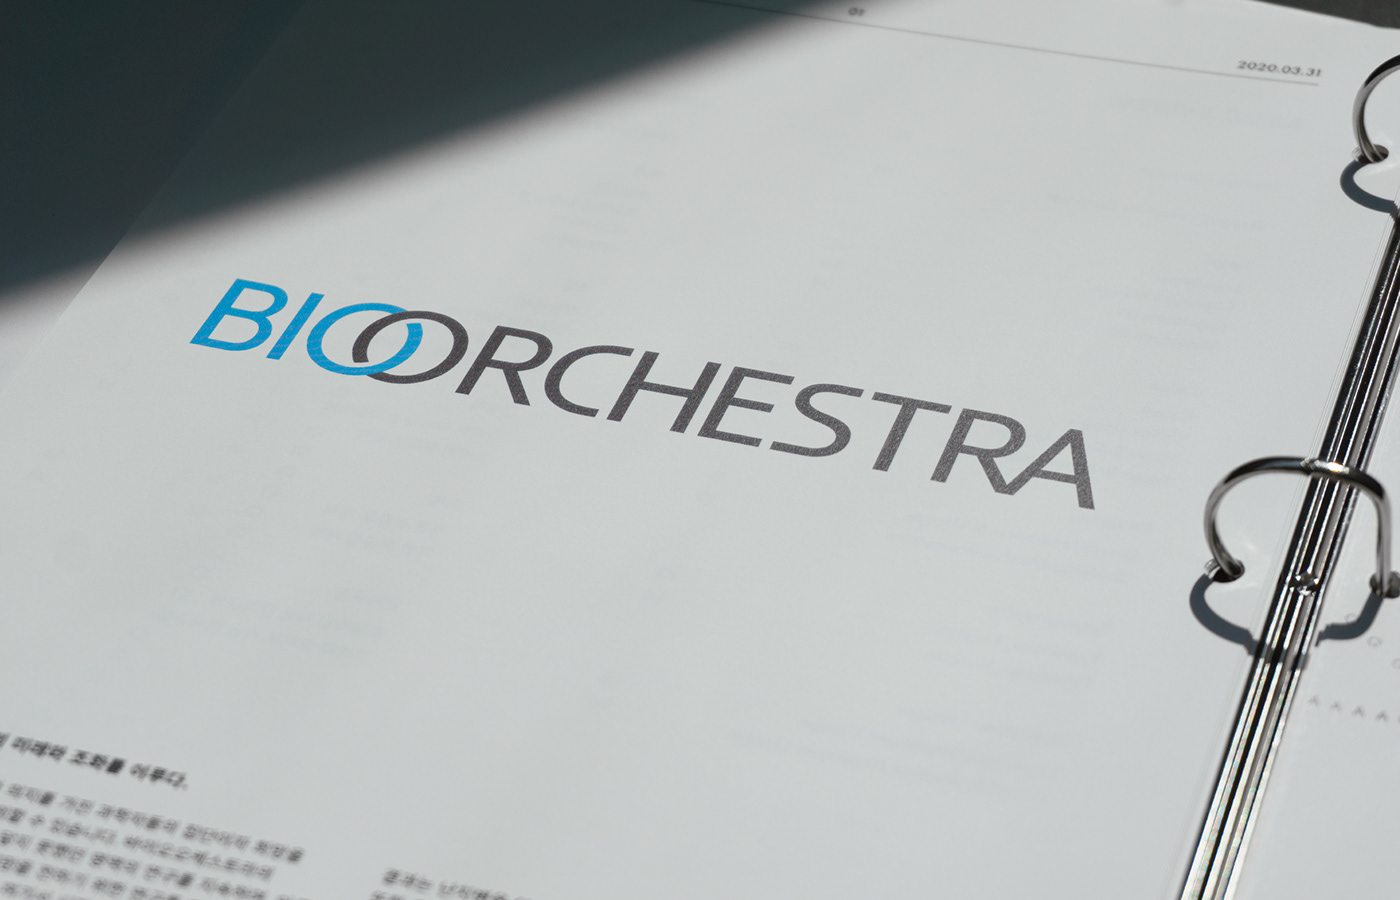 application bio biorchestra branddesign branding  identity Identity Design